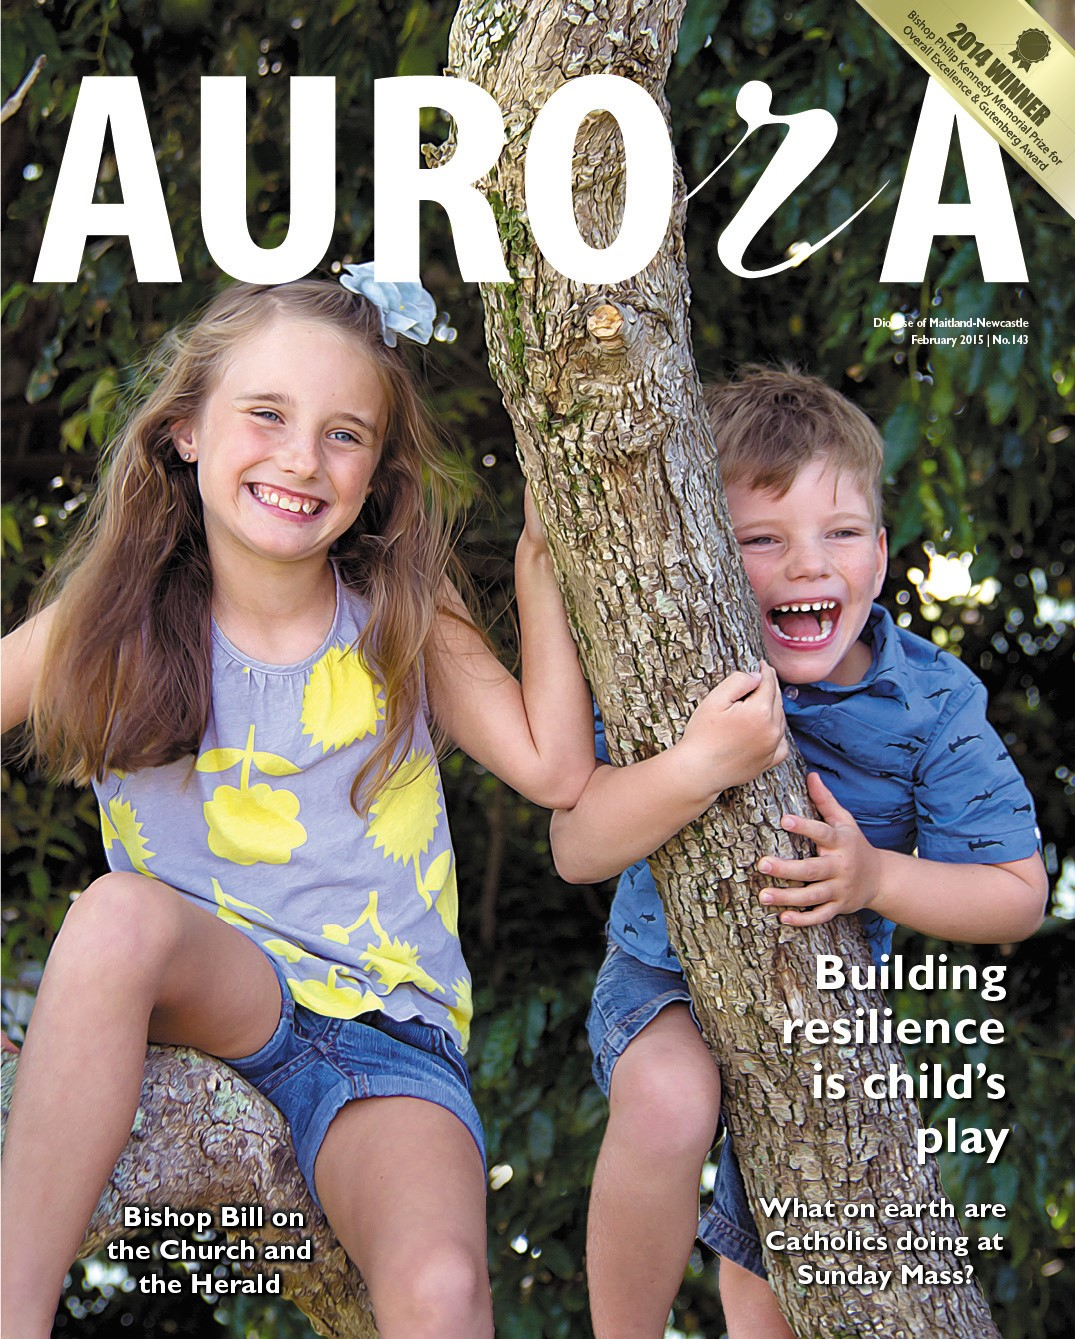 Aurora February 2015 Cover Image